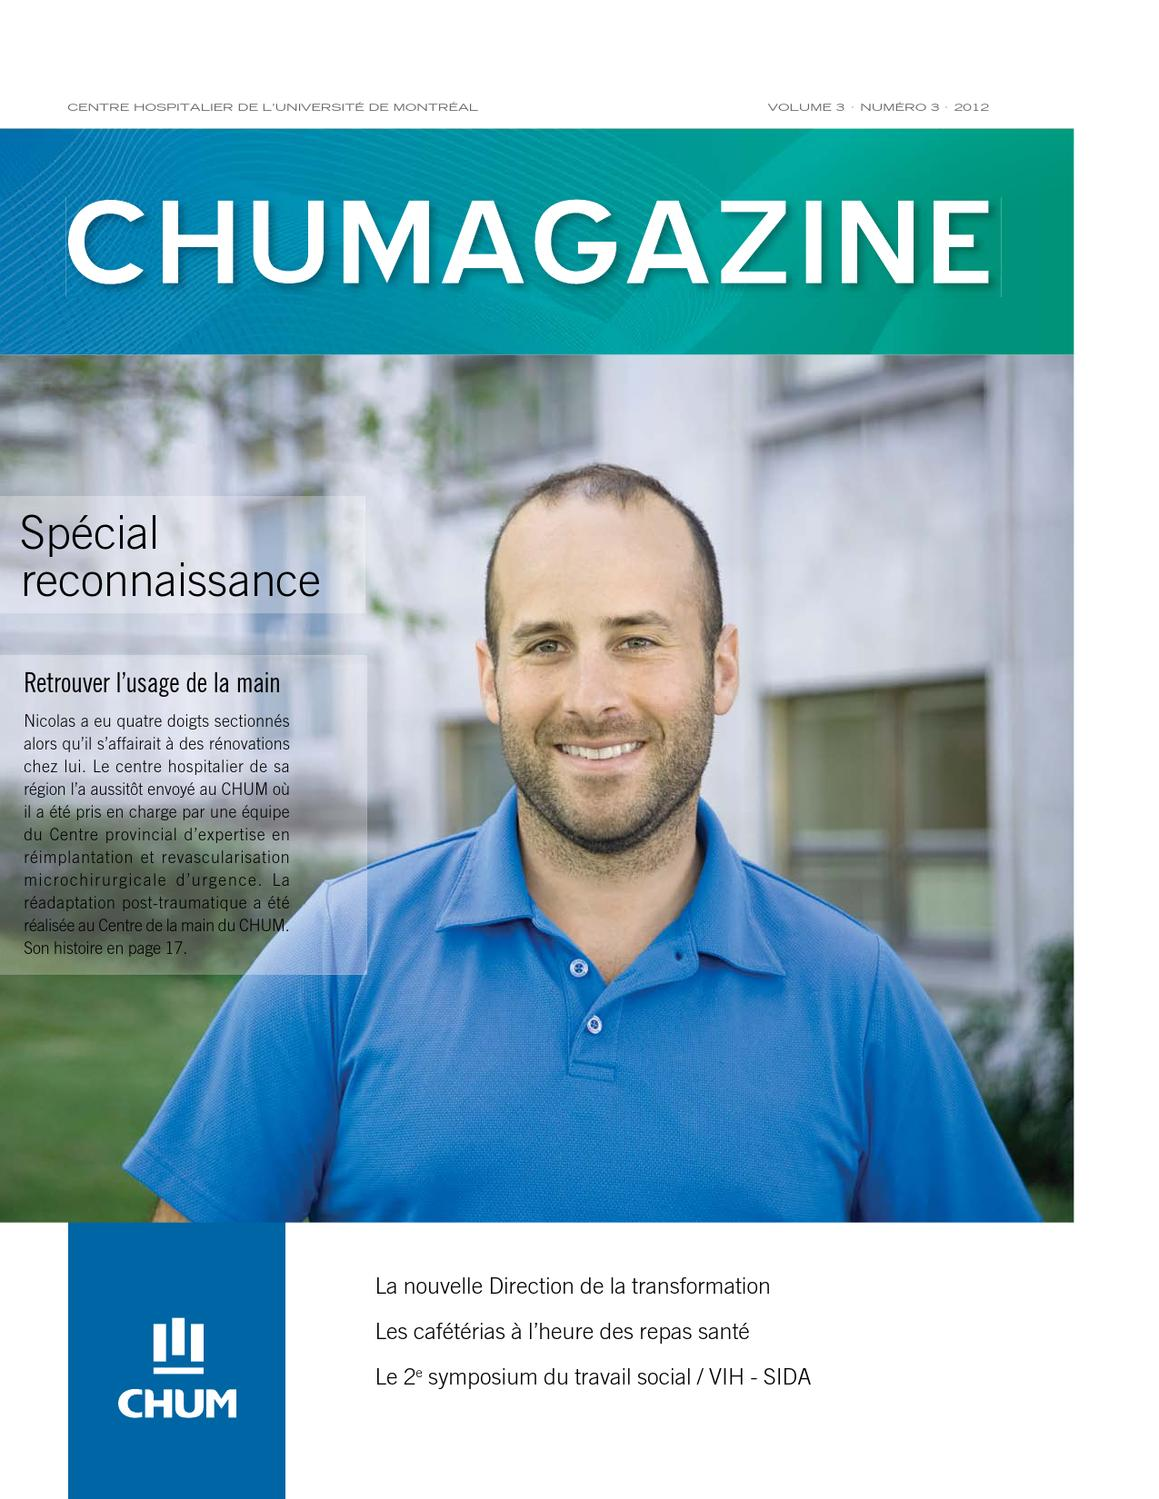 CHUMagazine Volume 3 numéro 3 by CHUM - issuu